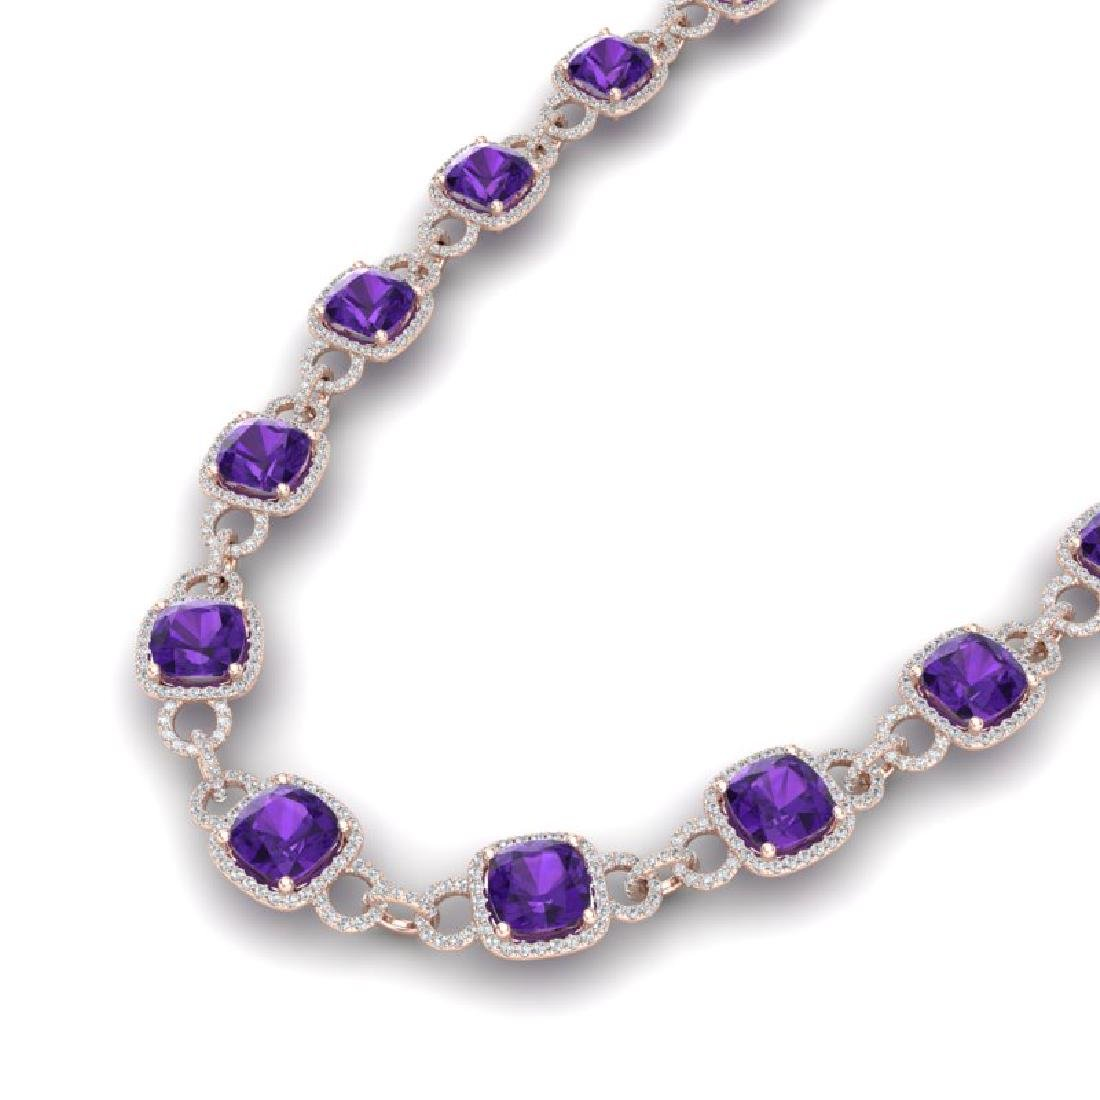 66 CTW Amethyst & VS/SI Diamond Necklace 14K Rose Gold